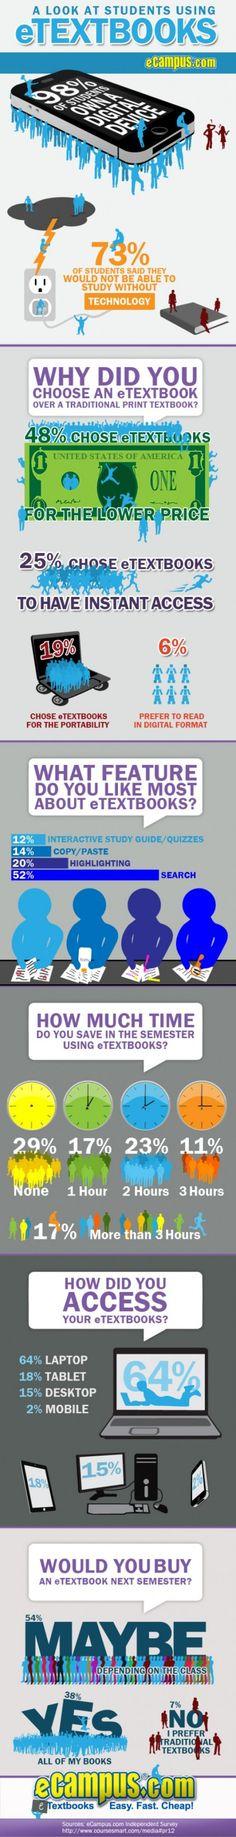 Infographicsslcsd educational technology resources internships